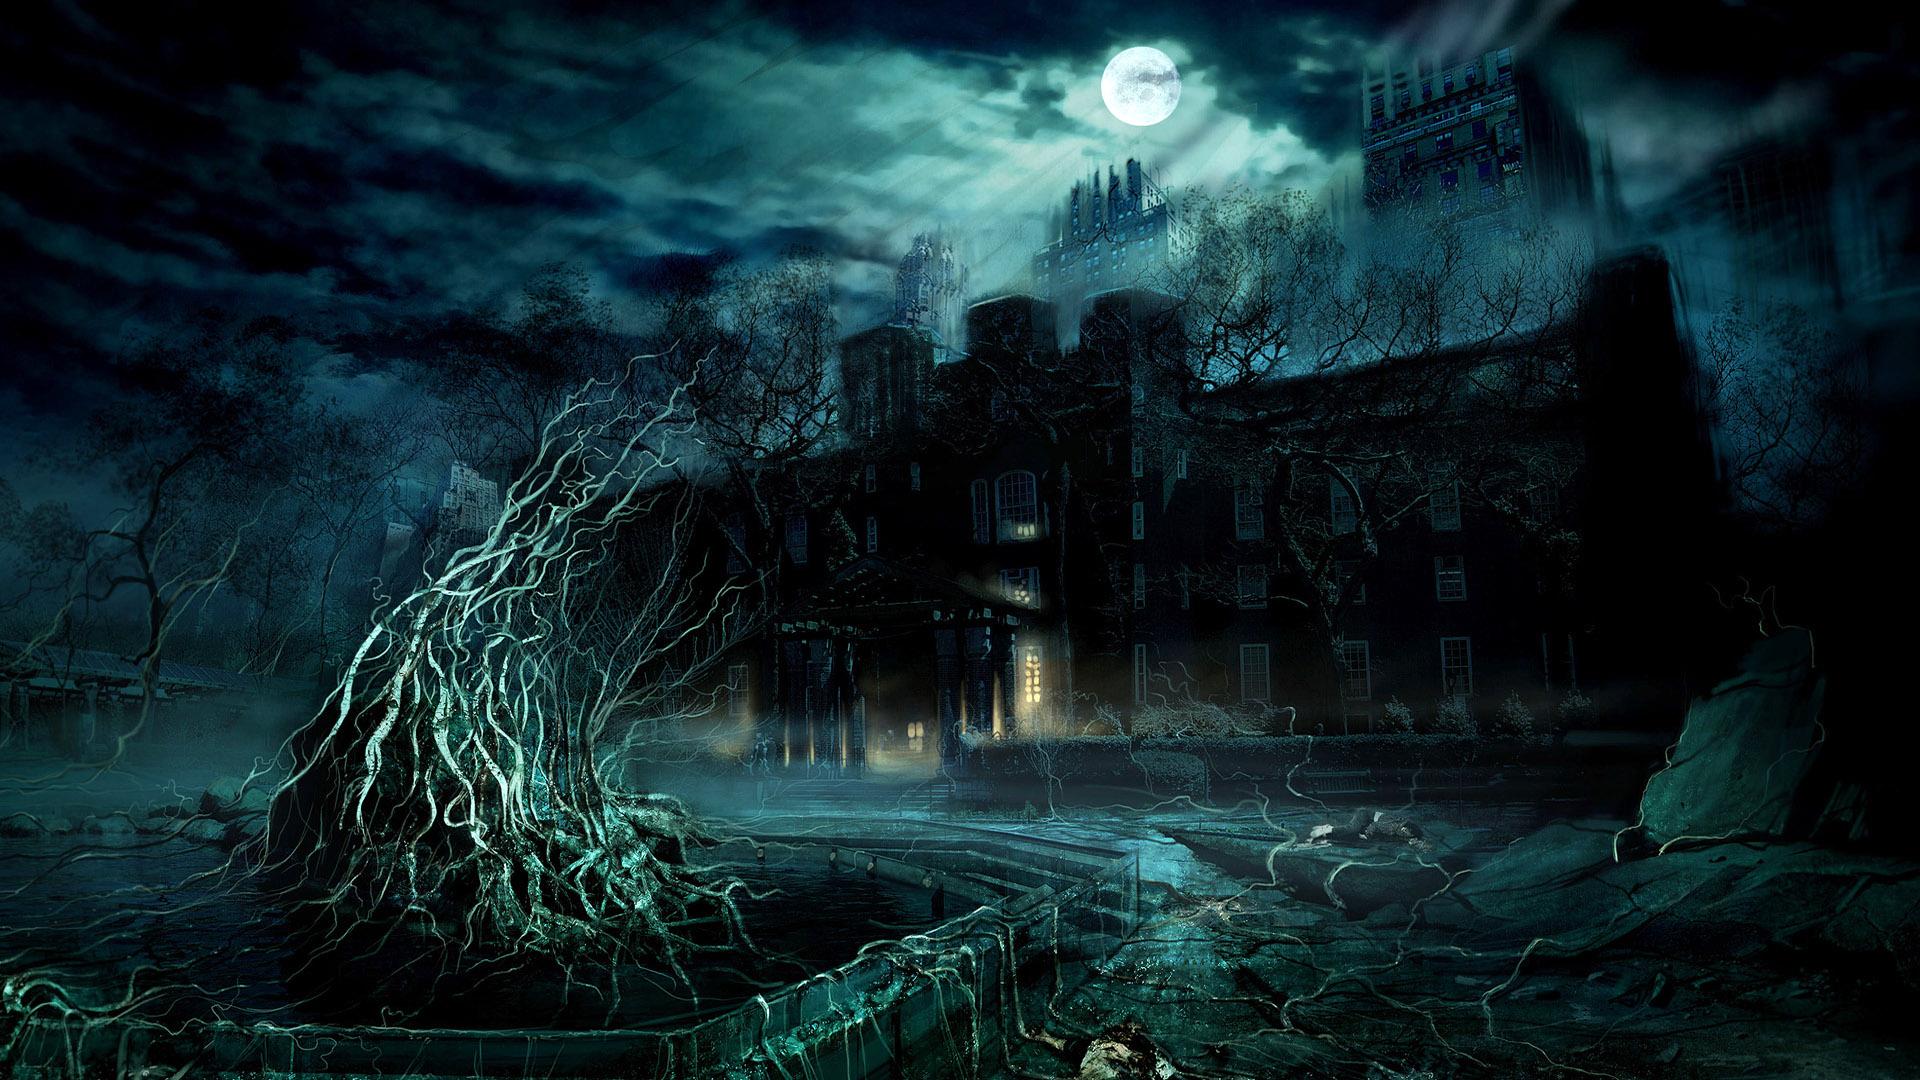 Dark Game Scene HD Wallpapers 1080p 1920x1080